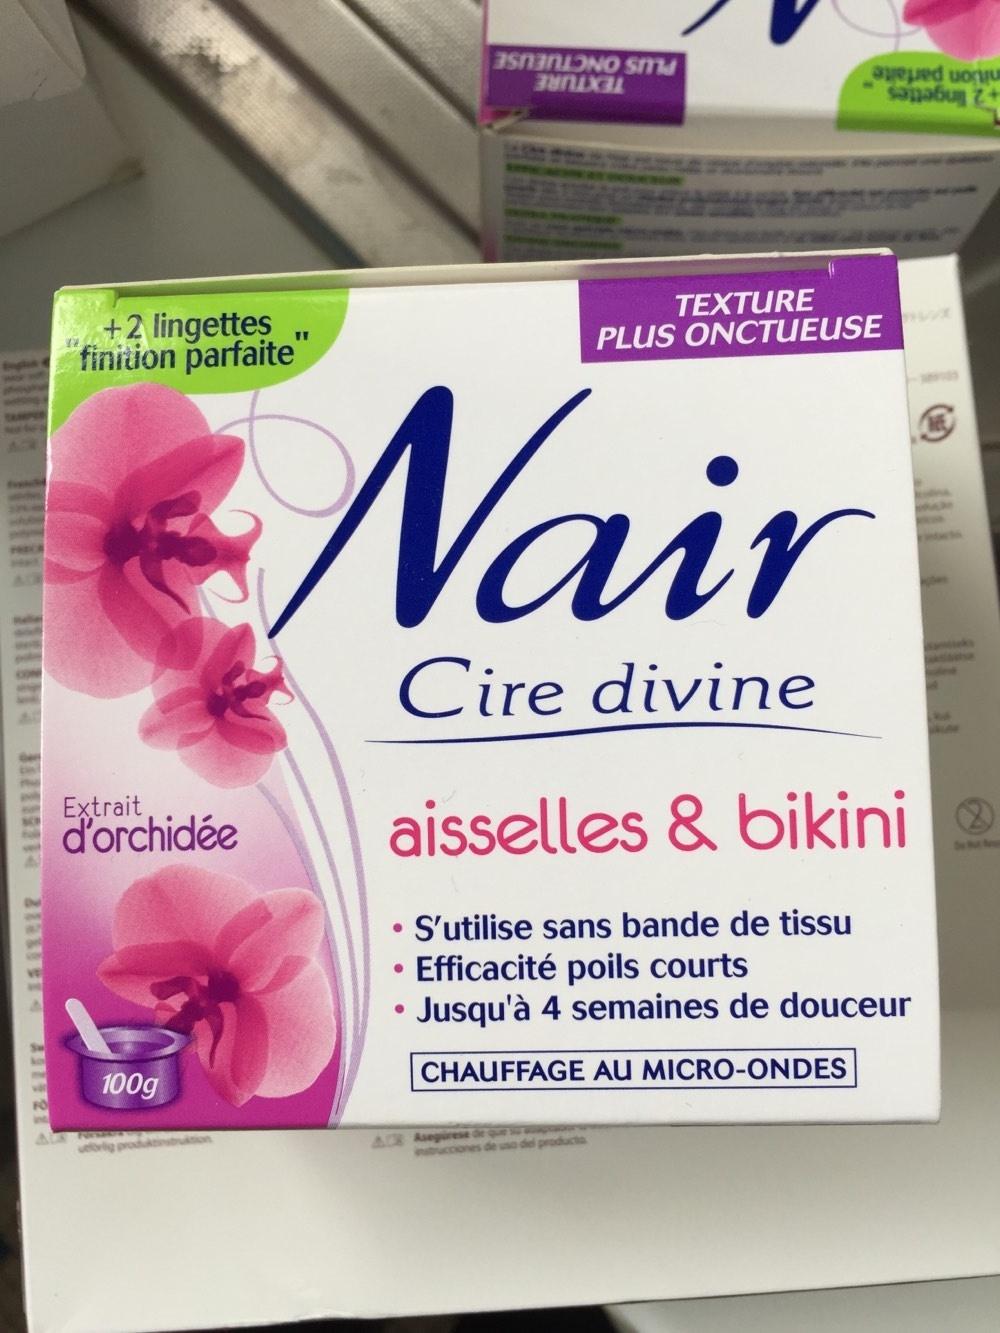 Cire divine aisselles & bikini - Product - fr